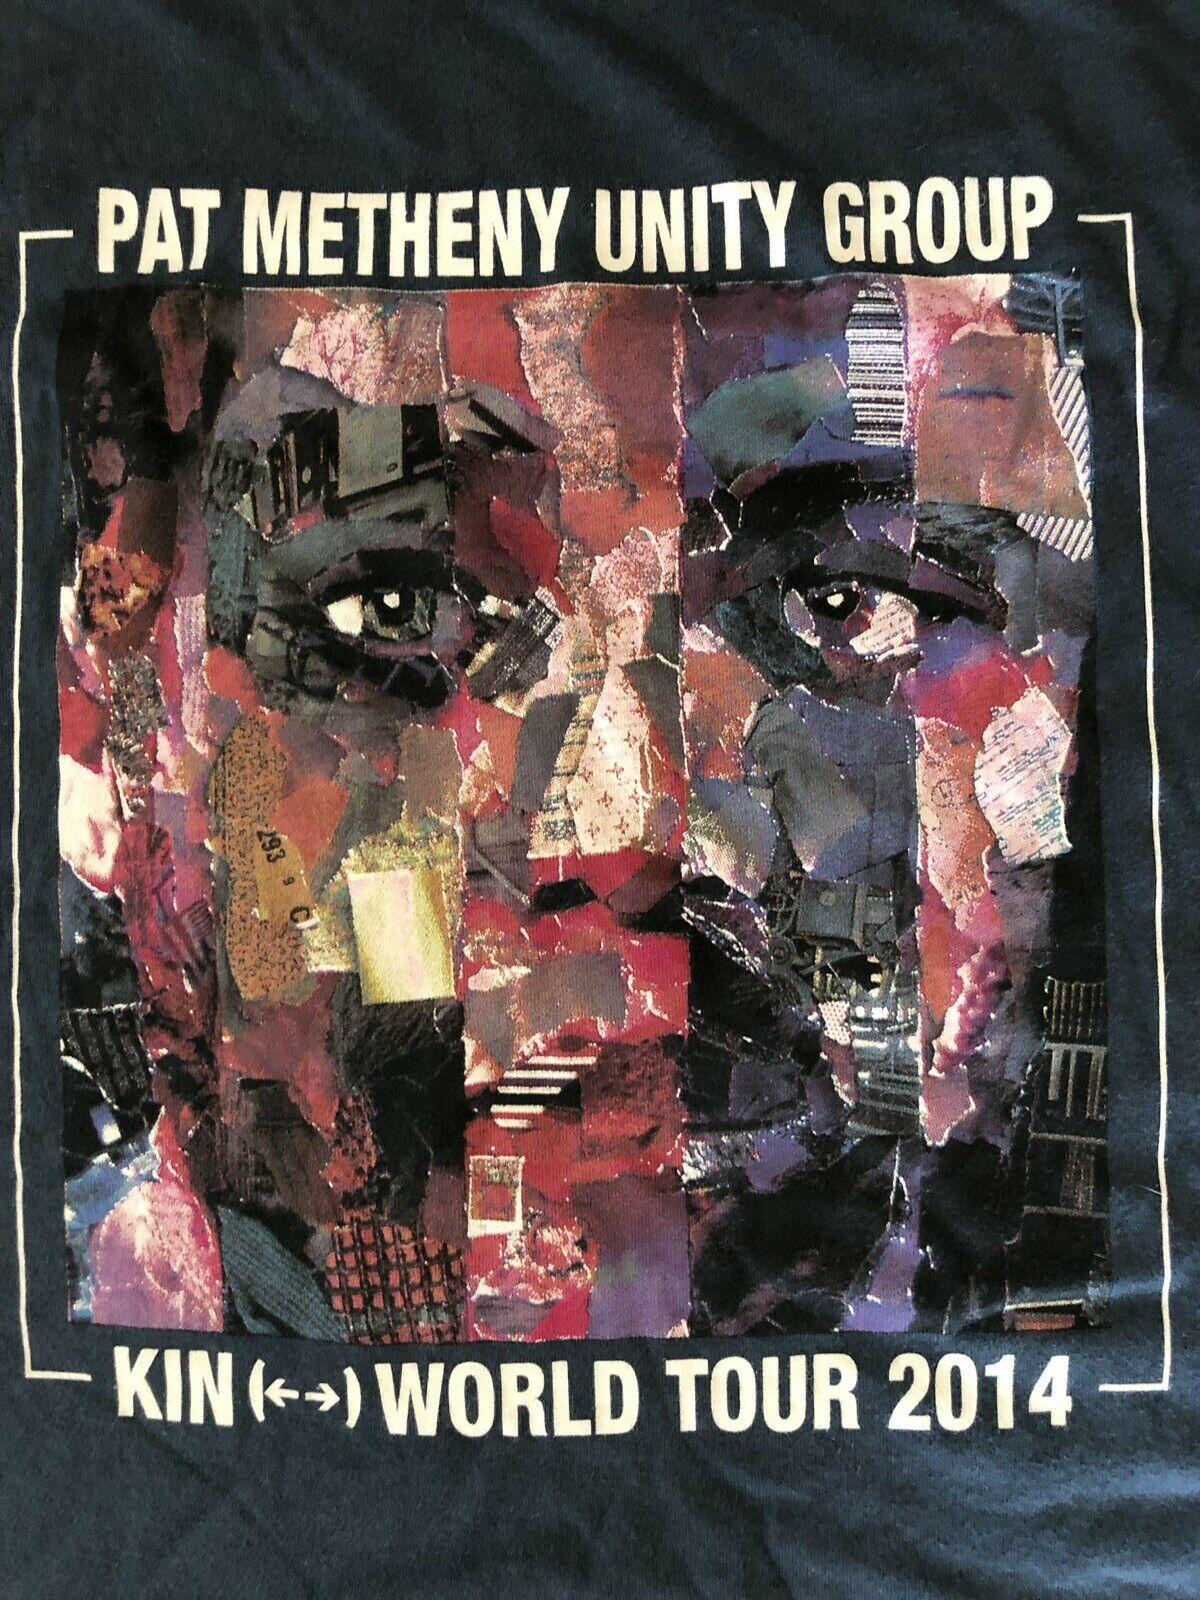 *** Pat Metheny grupo familiar gira mundial de 2014 LG camiseta ***